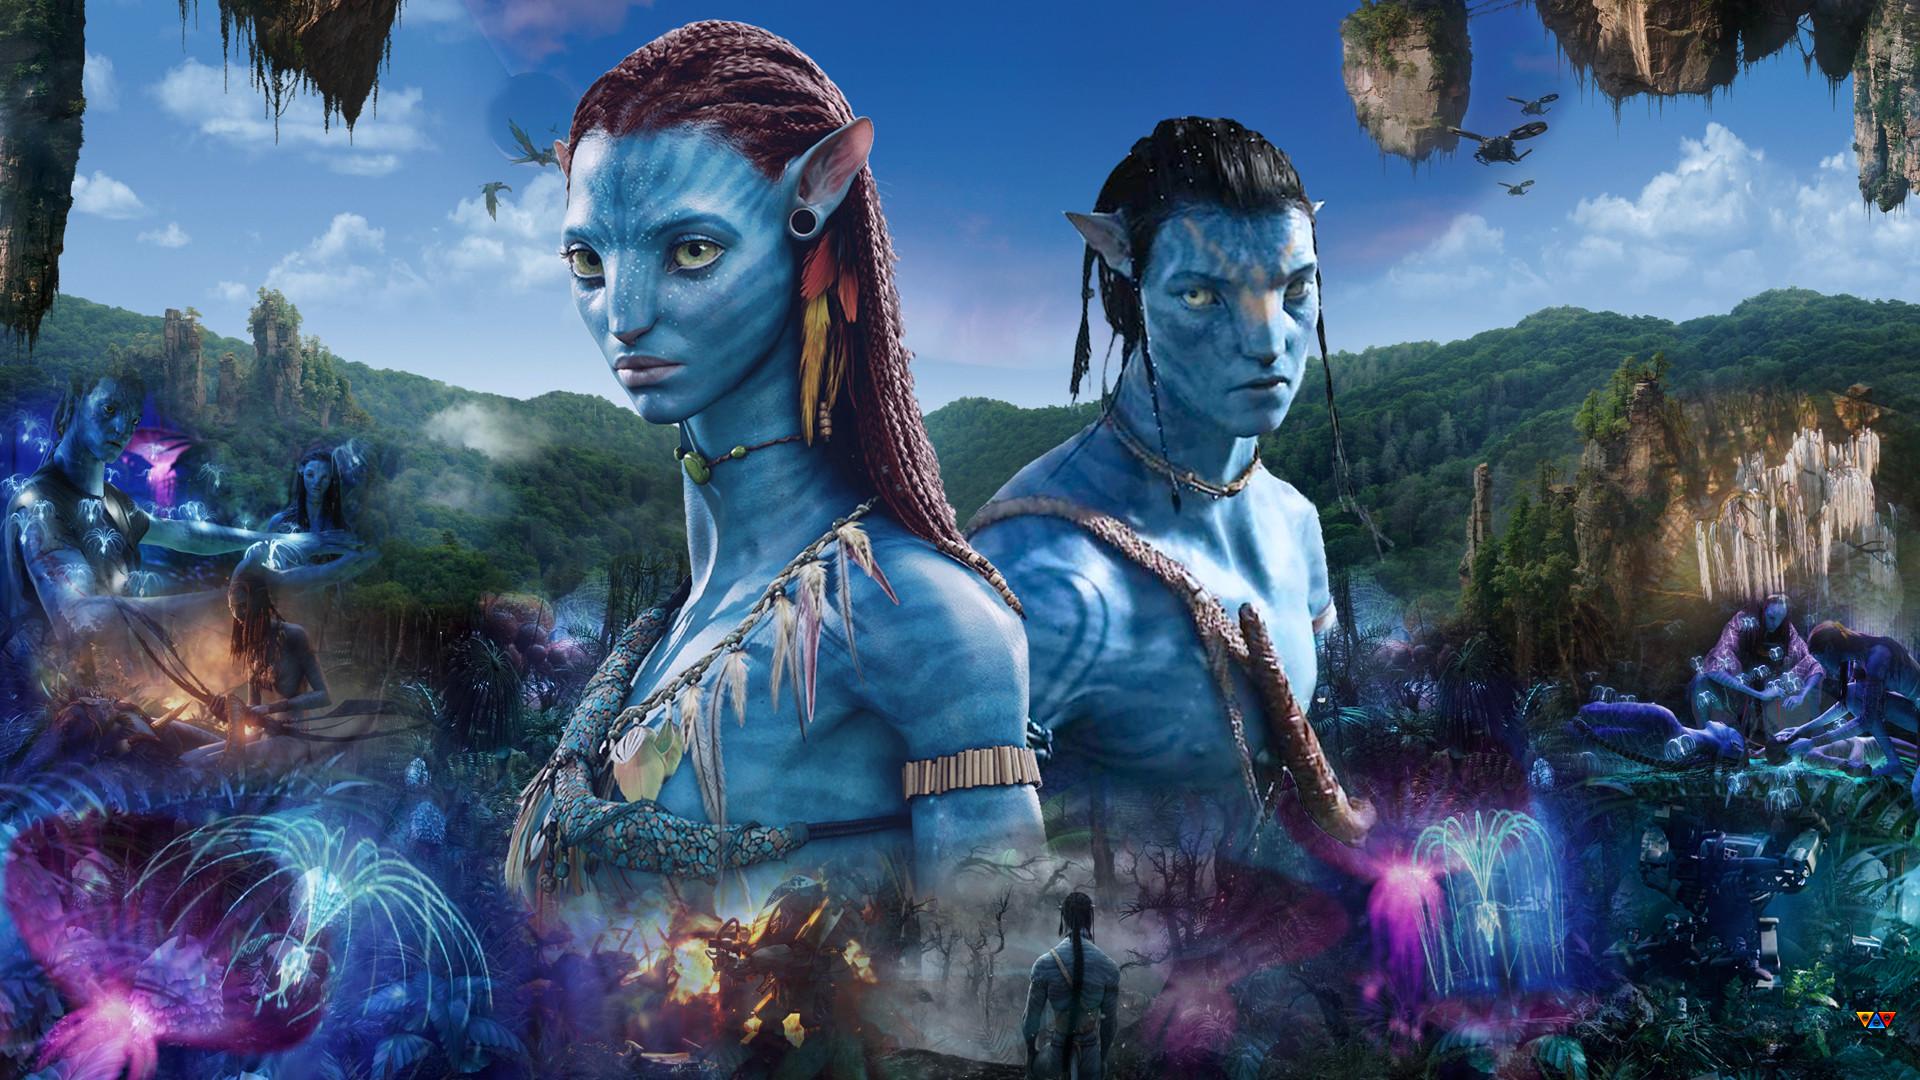 report on avatar movie